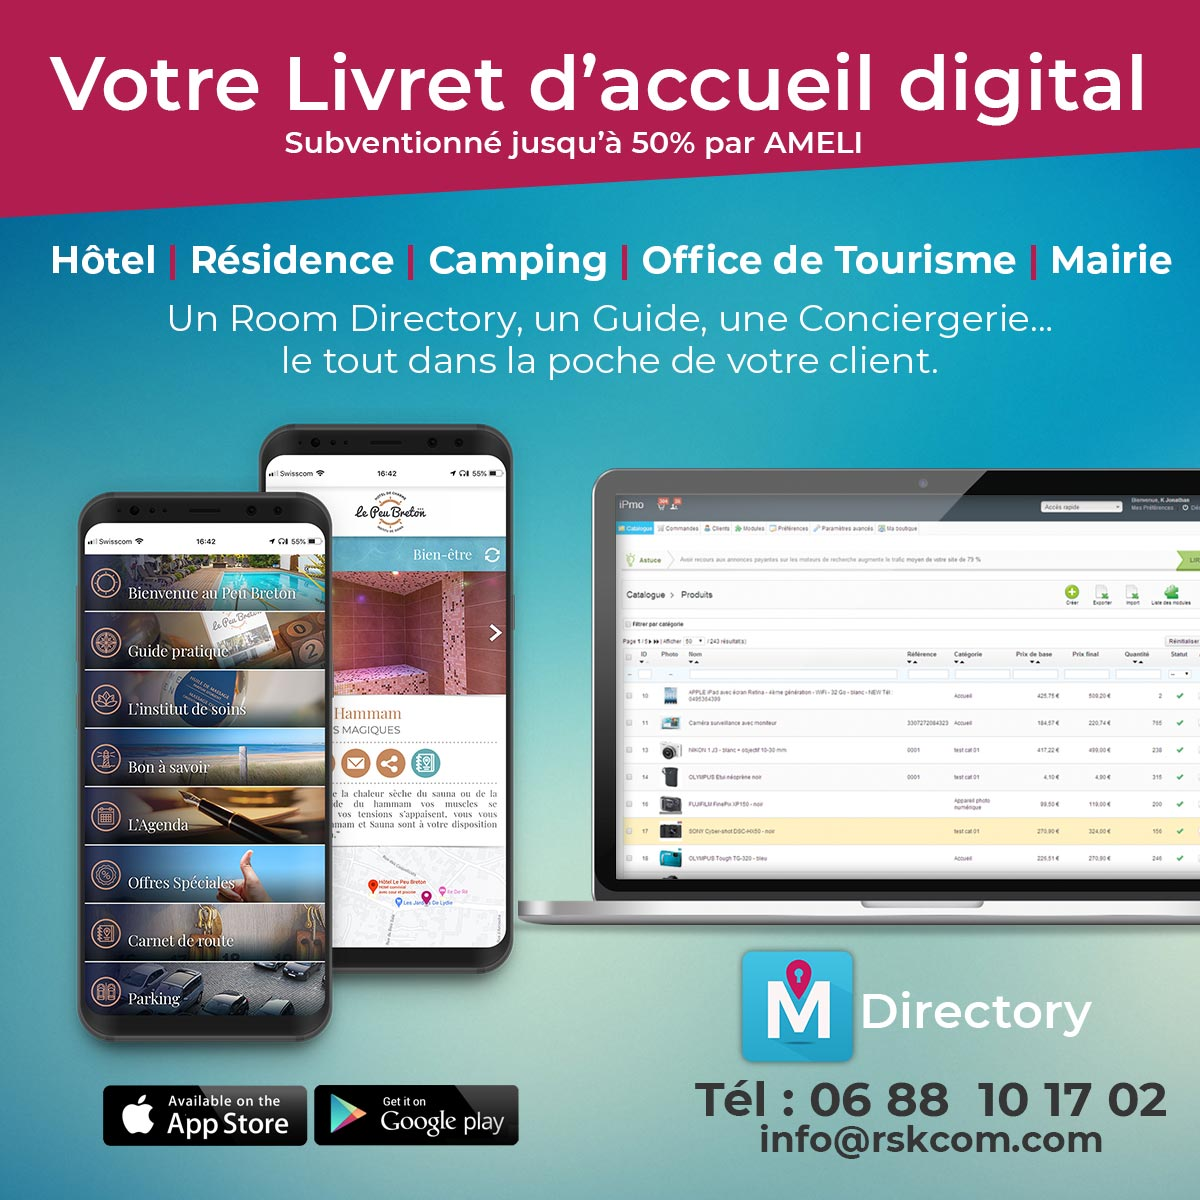 room directory digital mobile livret d'accueil